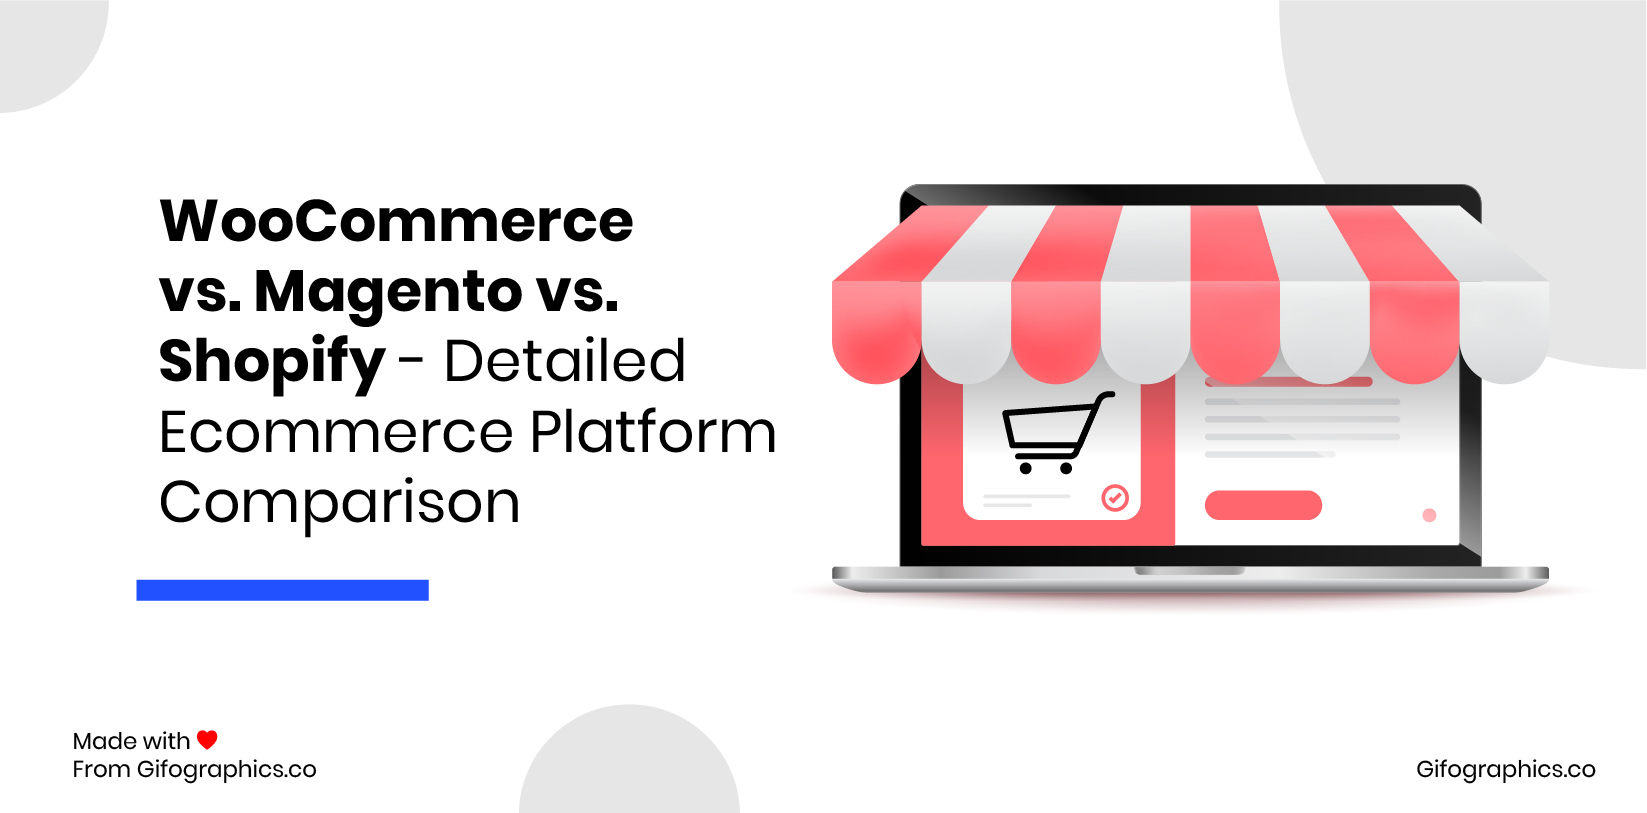 WooCommerce vs. Magento vs. Shopify - Detailed eCommerce Platform Comparison